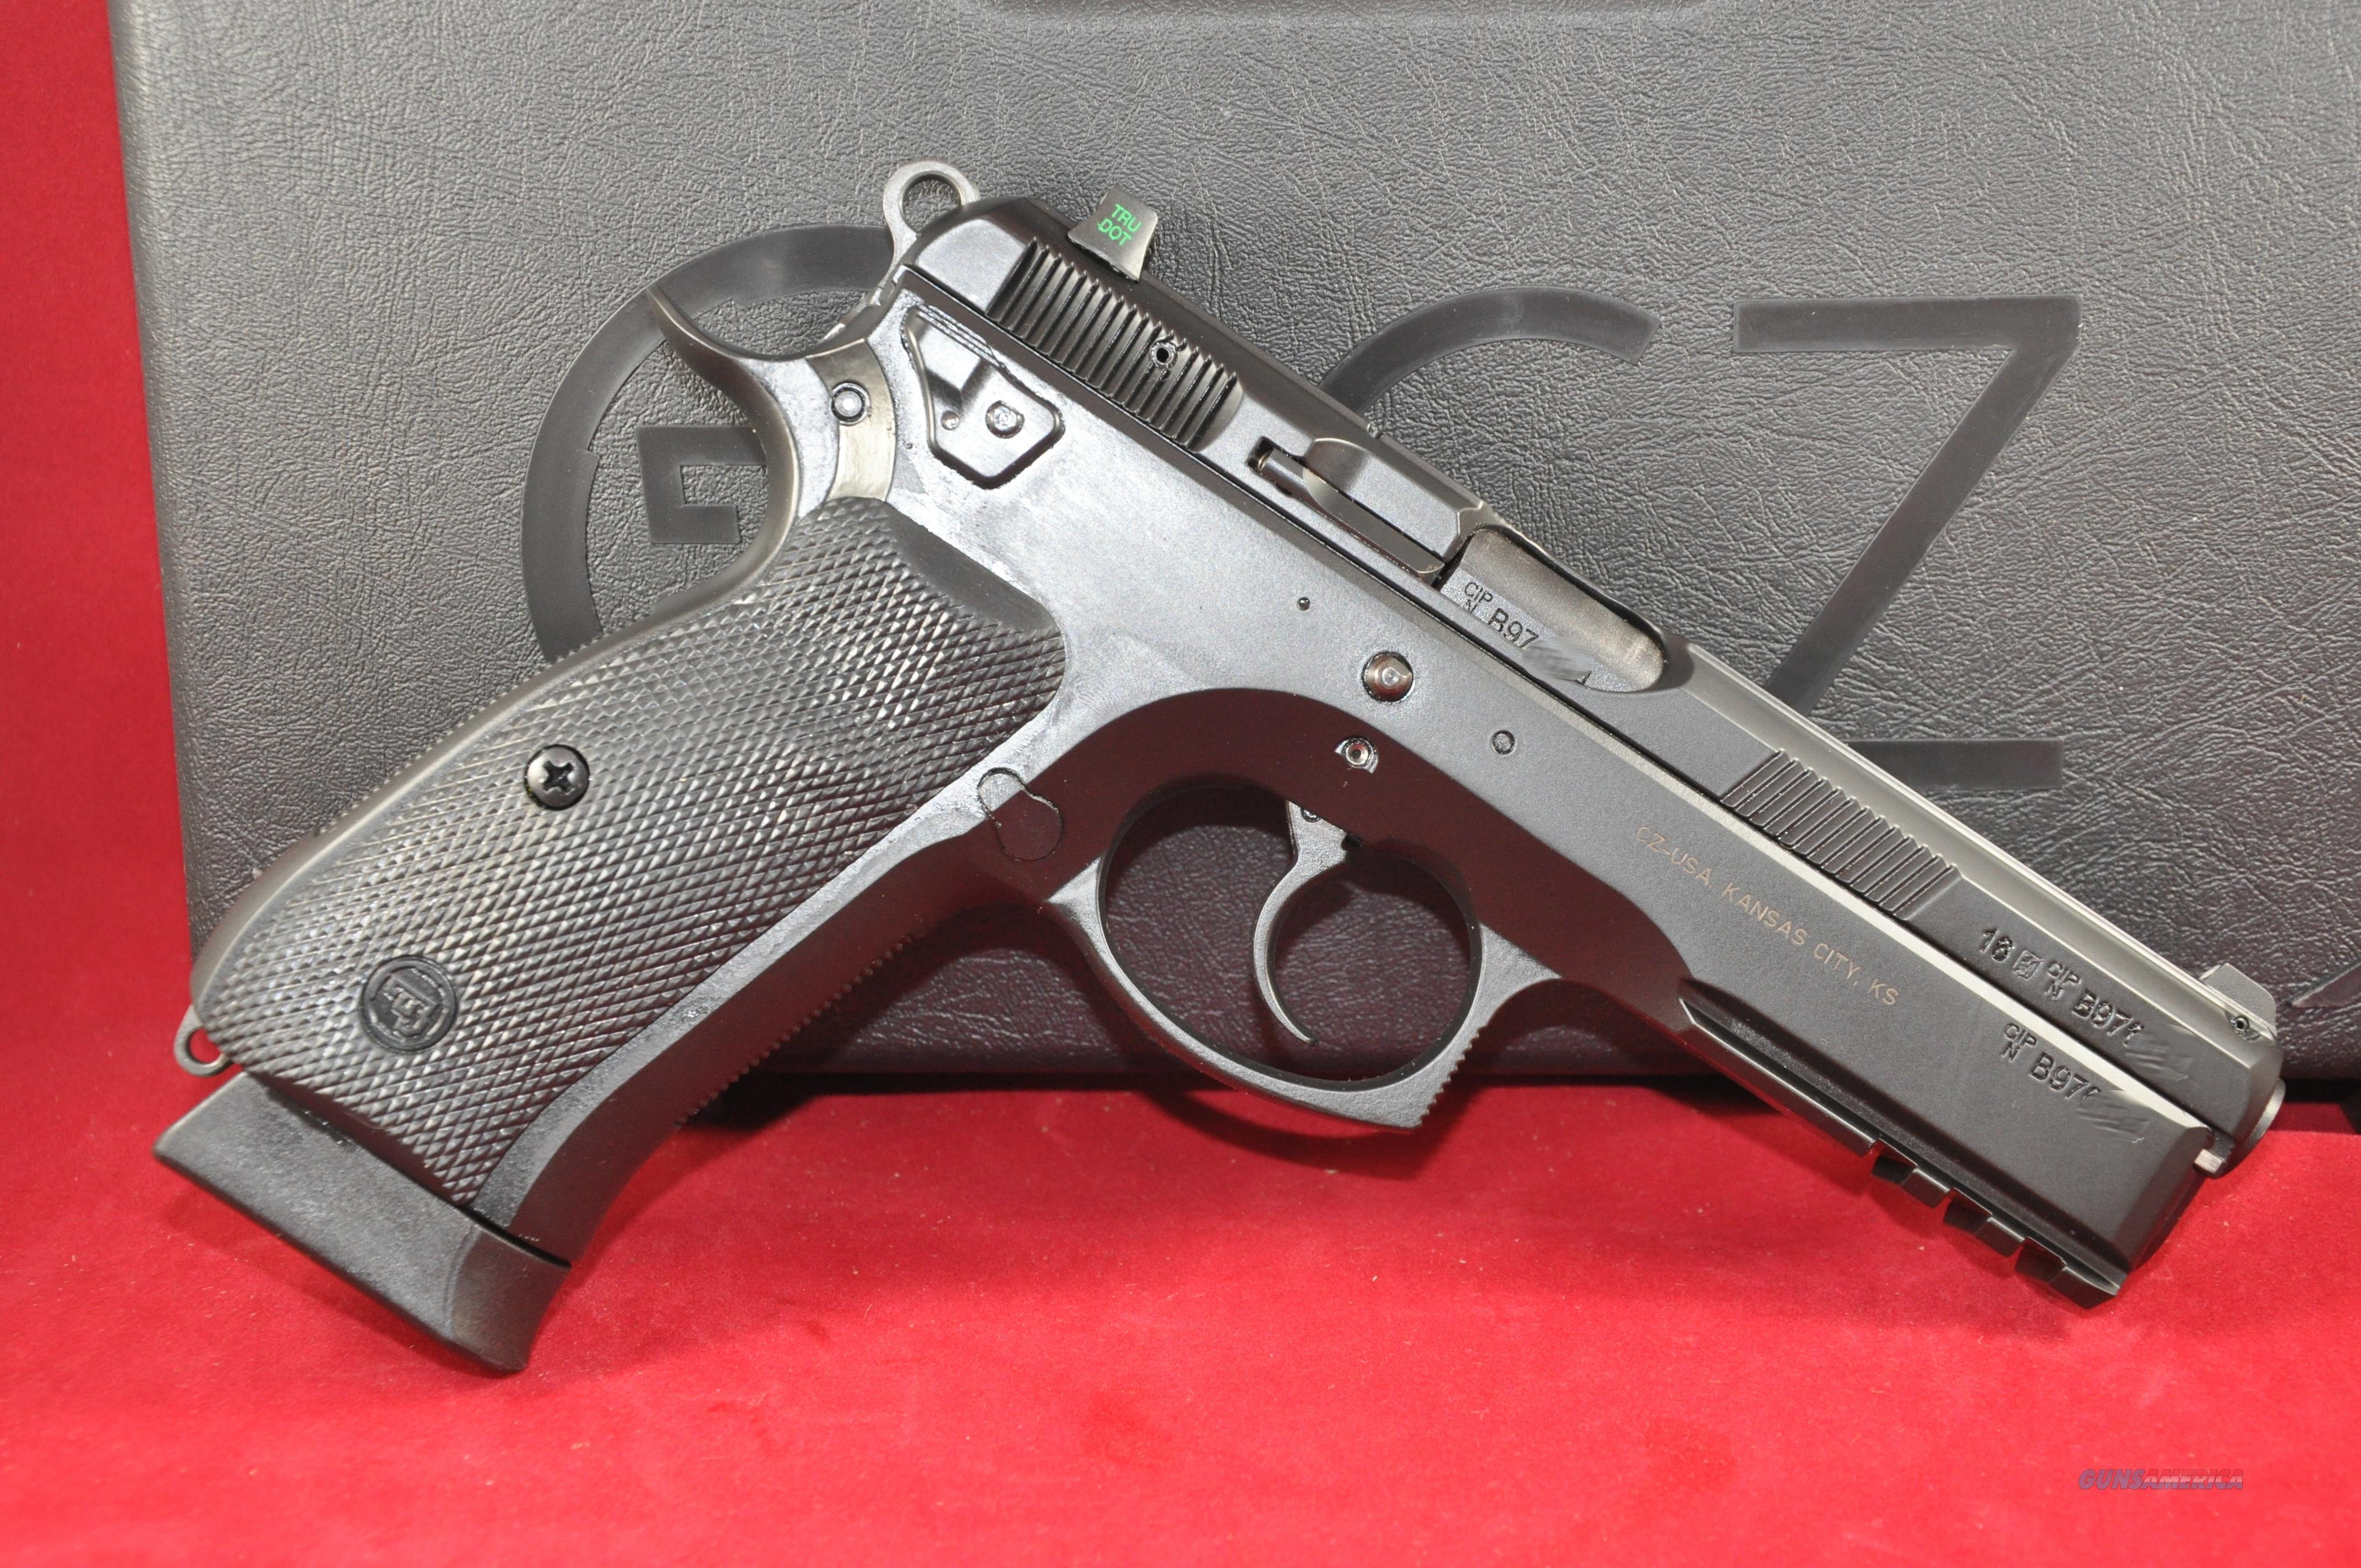 CZ 75 SP01 Tactical 9mm Decocker 18+1 Layaway NoCCFee 91153  Guns > Pistols > CZ Pistols